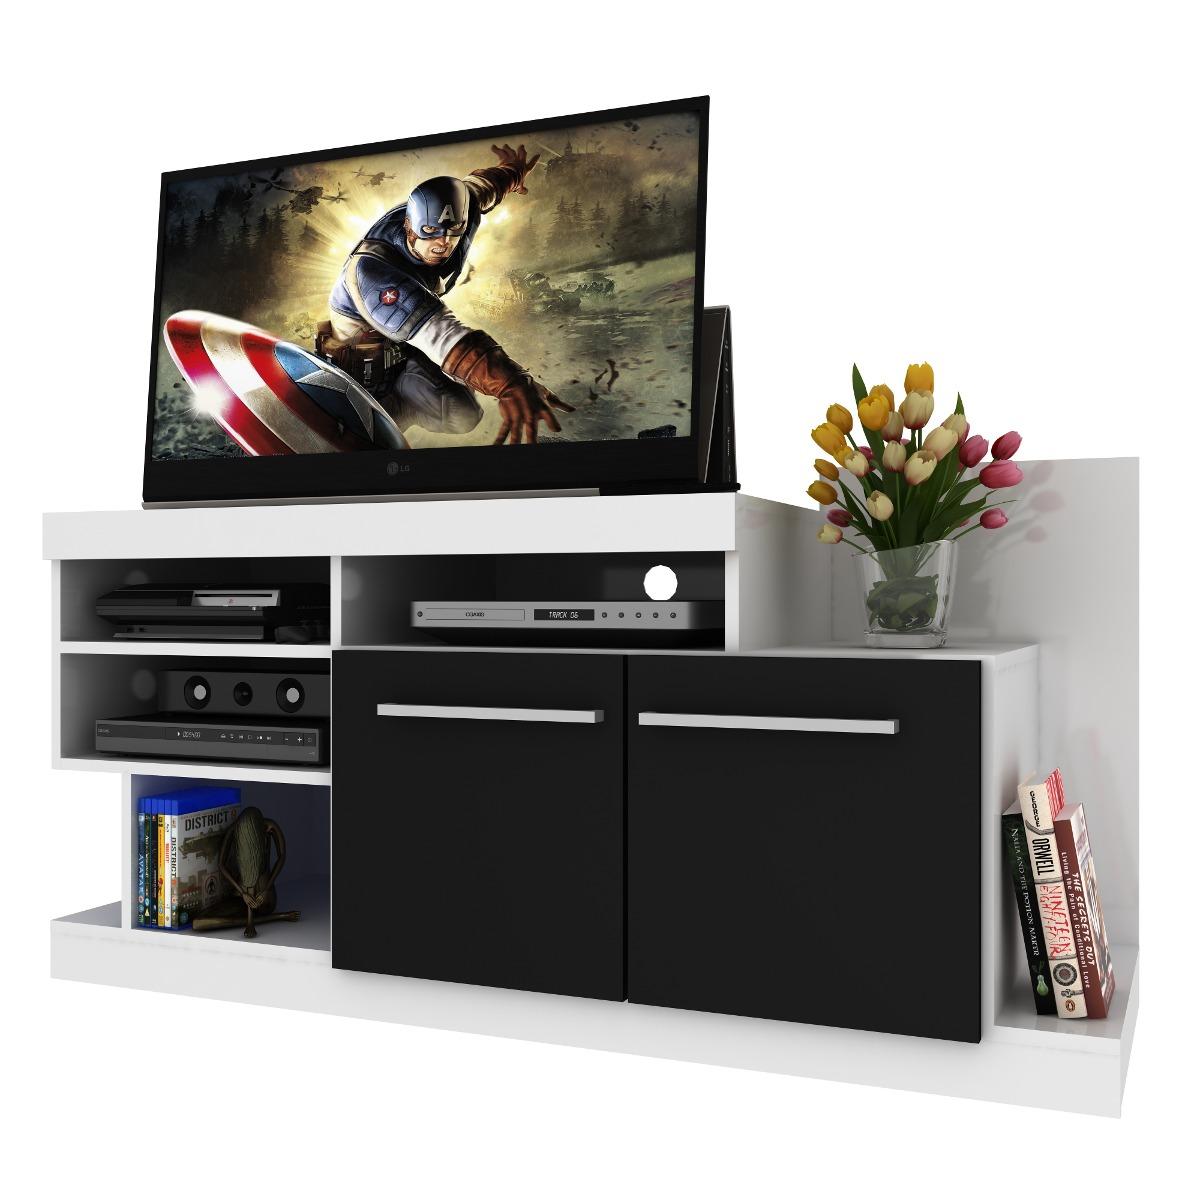 Rack mesa de tv lcd dvd mueble de comedor living for Mueble para dvd